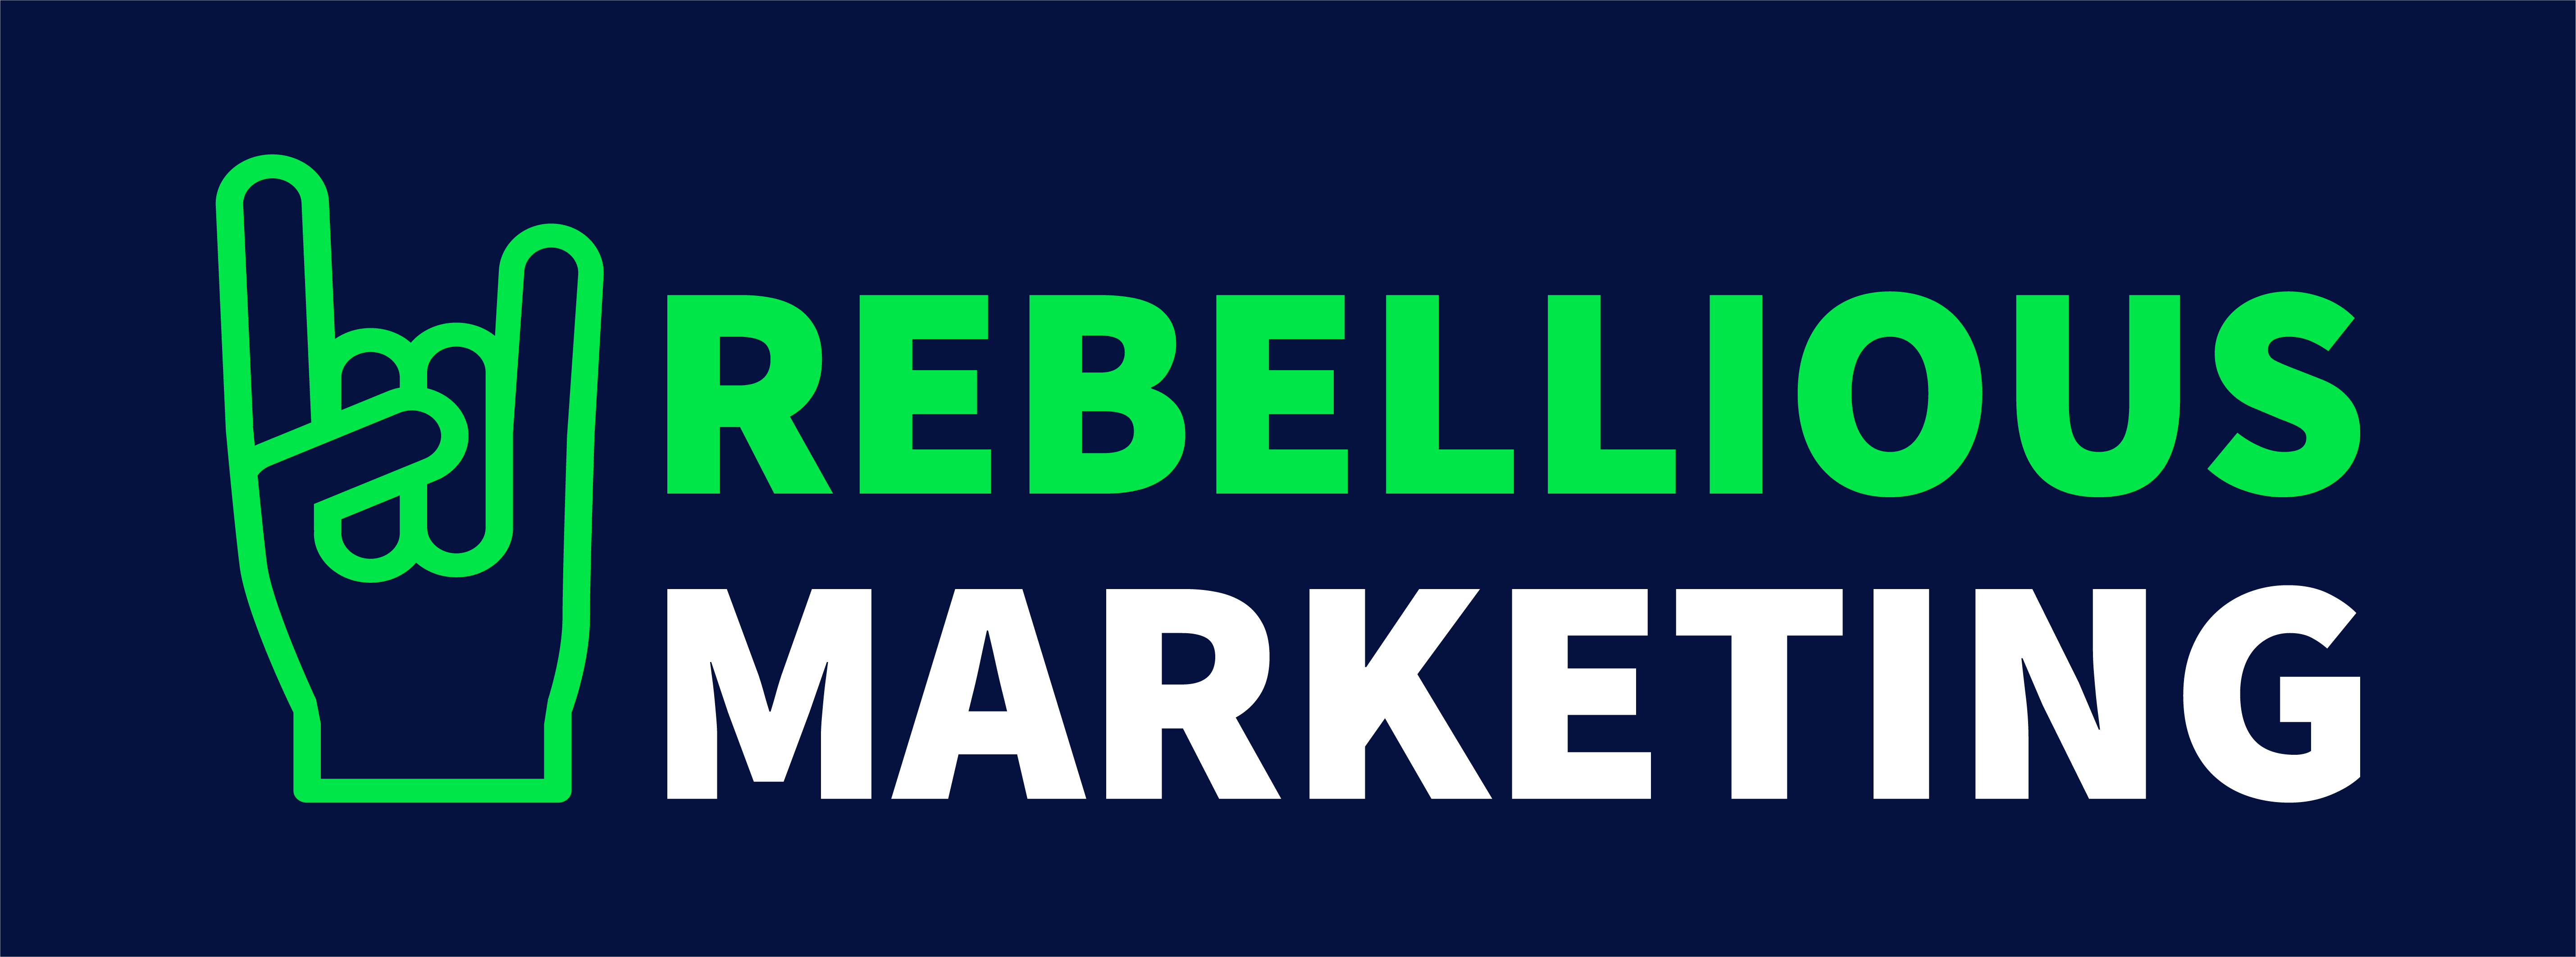 Rebellious Marketing Logo